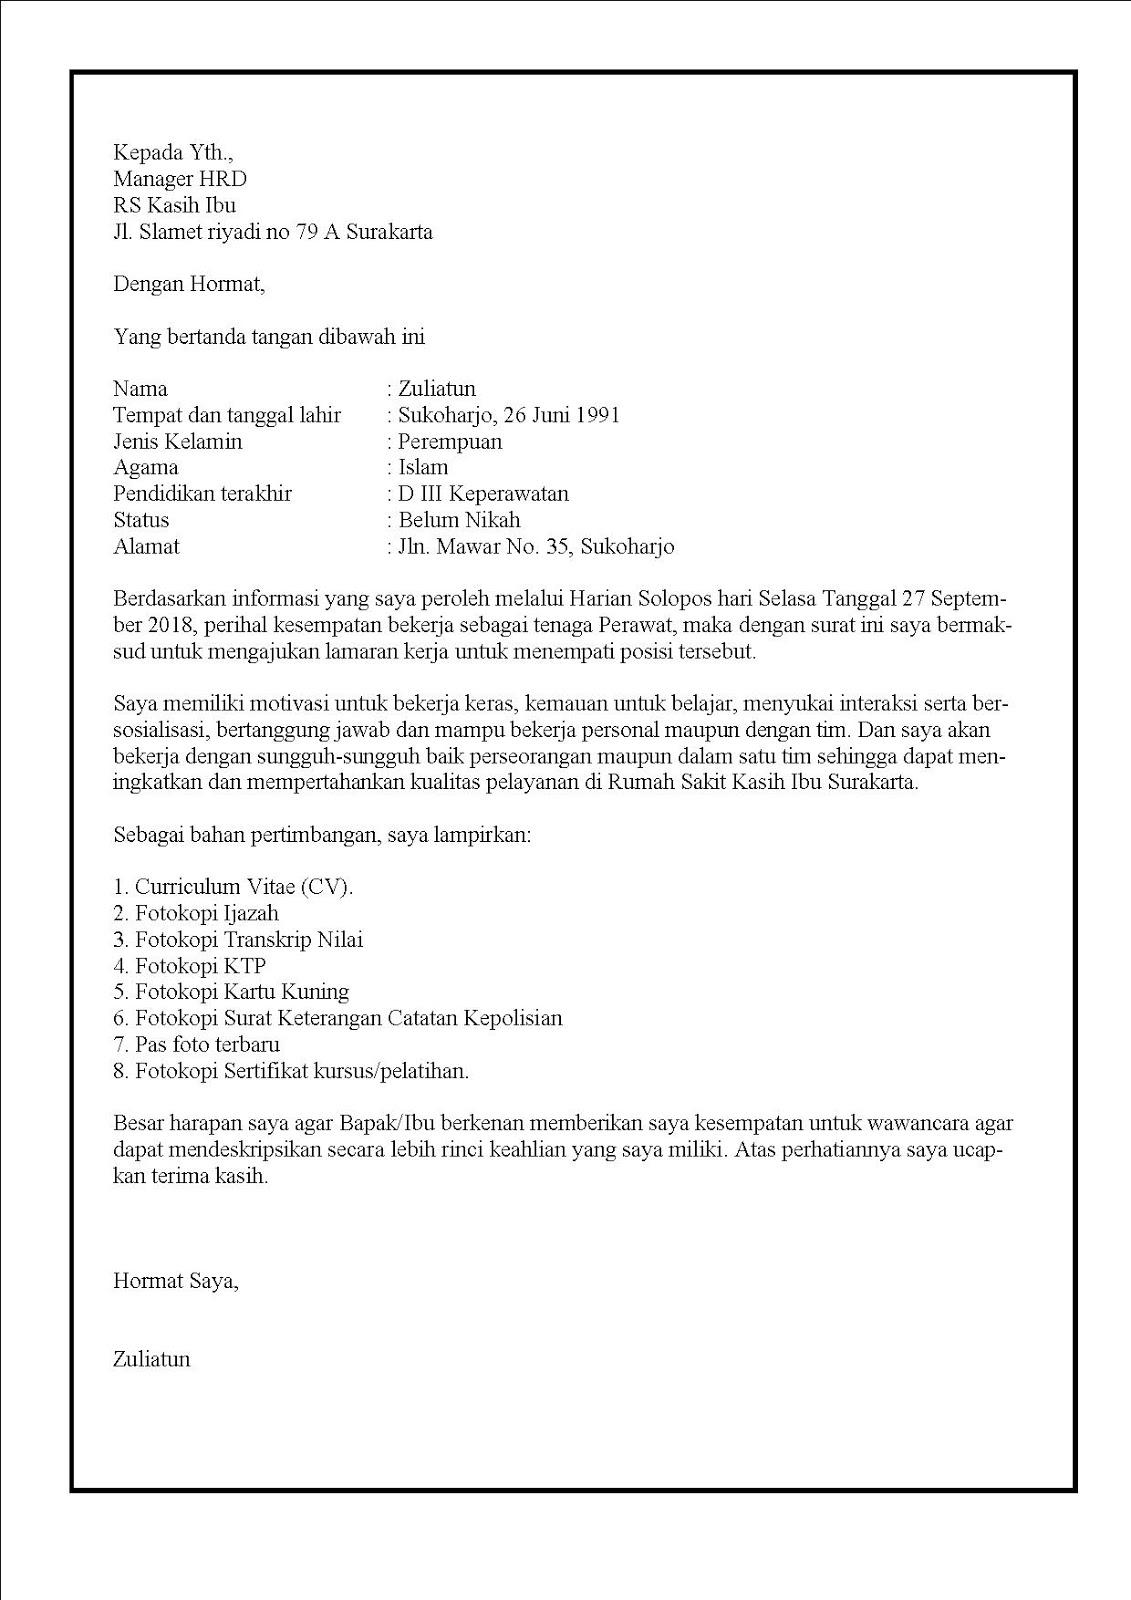 Contoh surat lamaran kerja di rumah sakit swasta